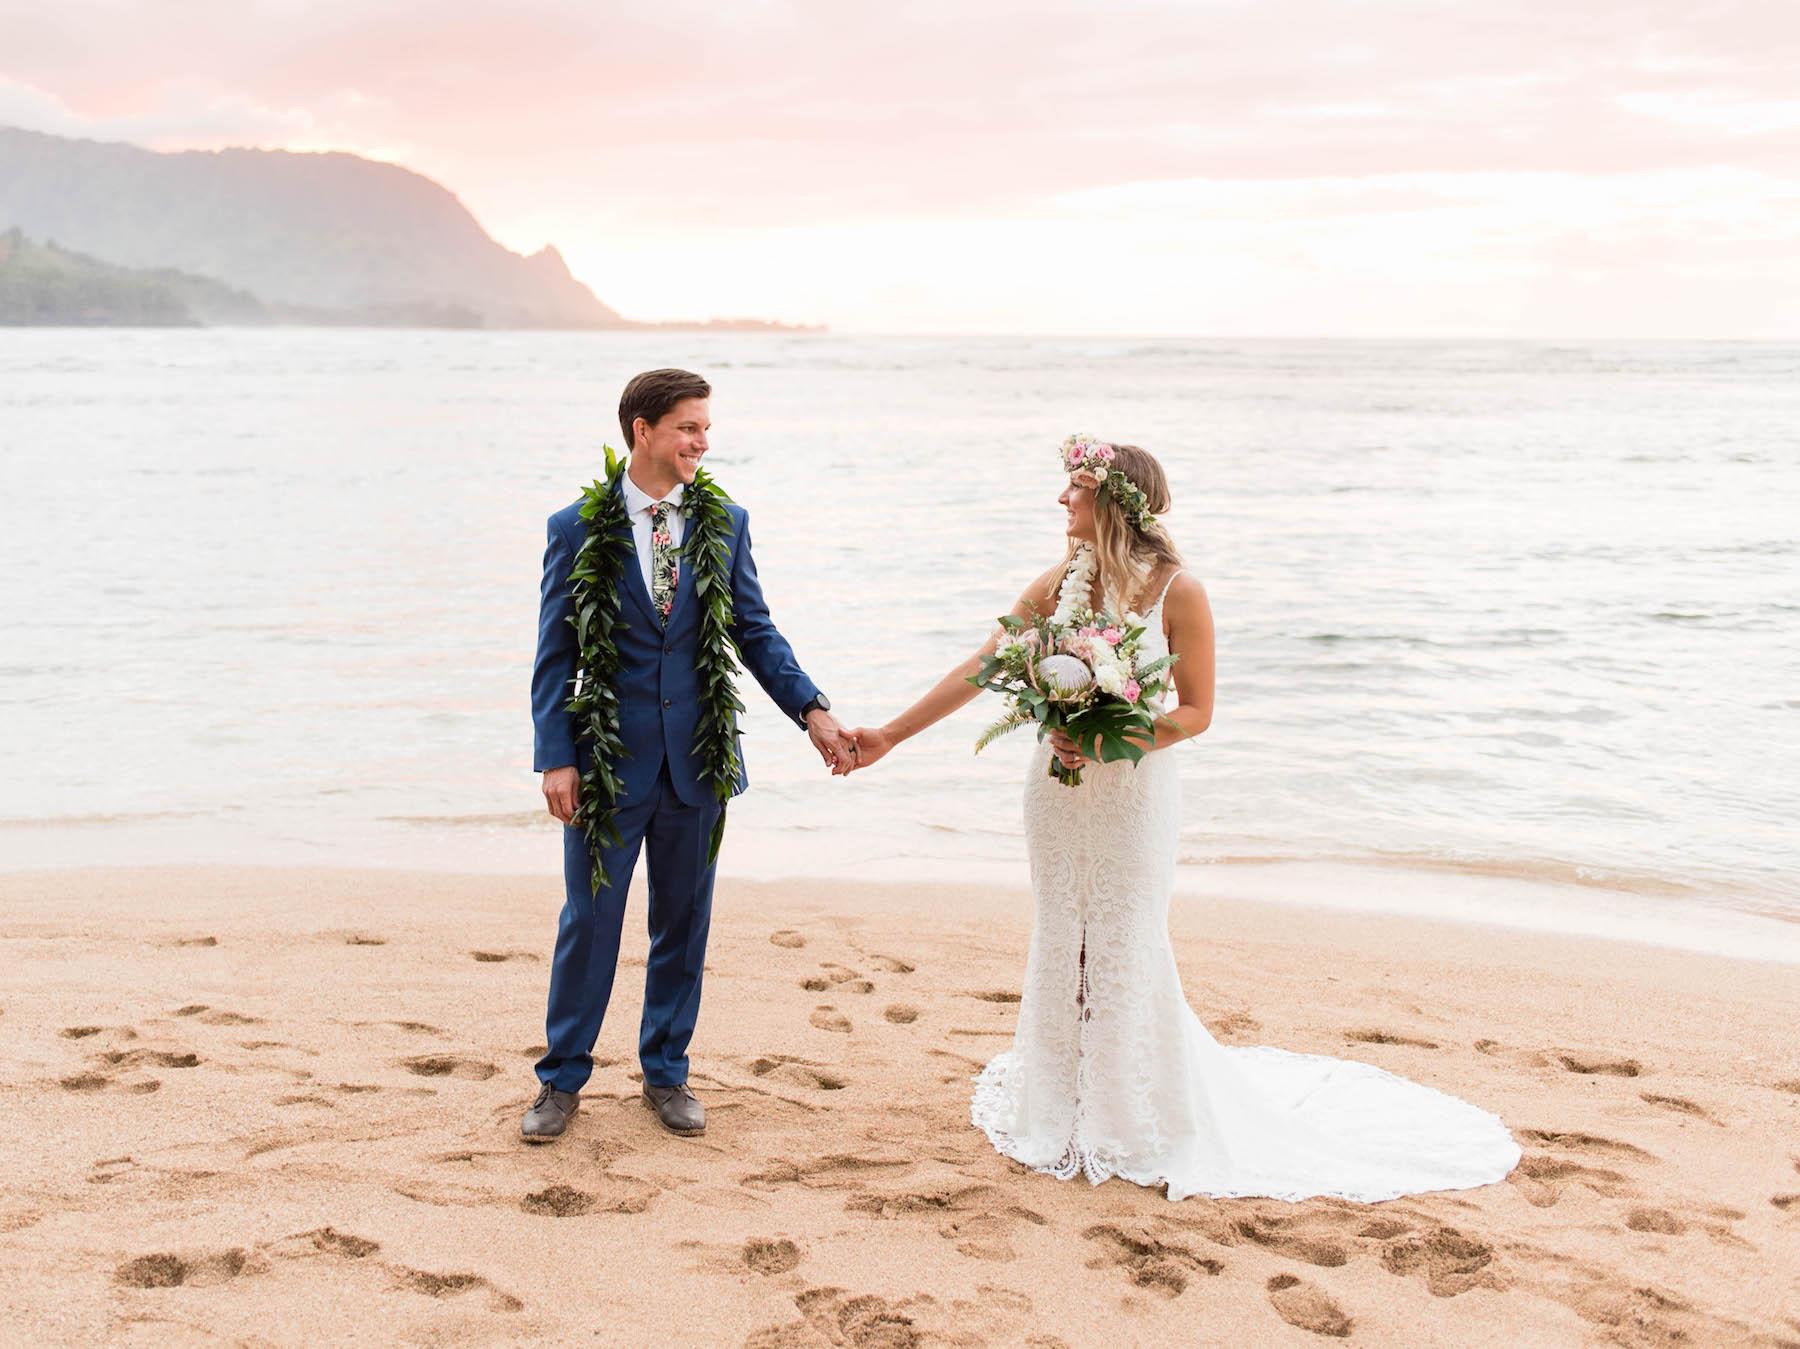 Couple eloping on a beach in Kauai.